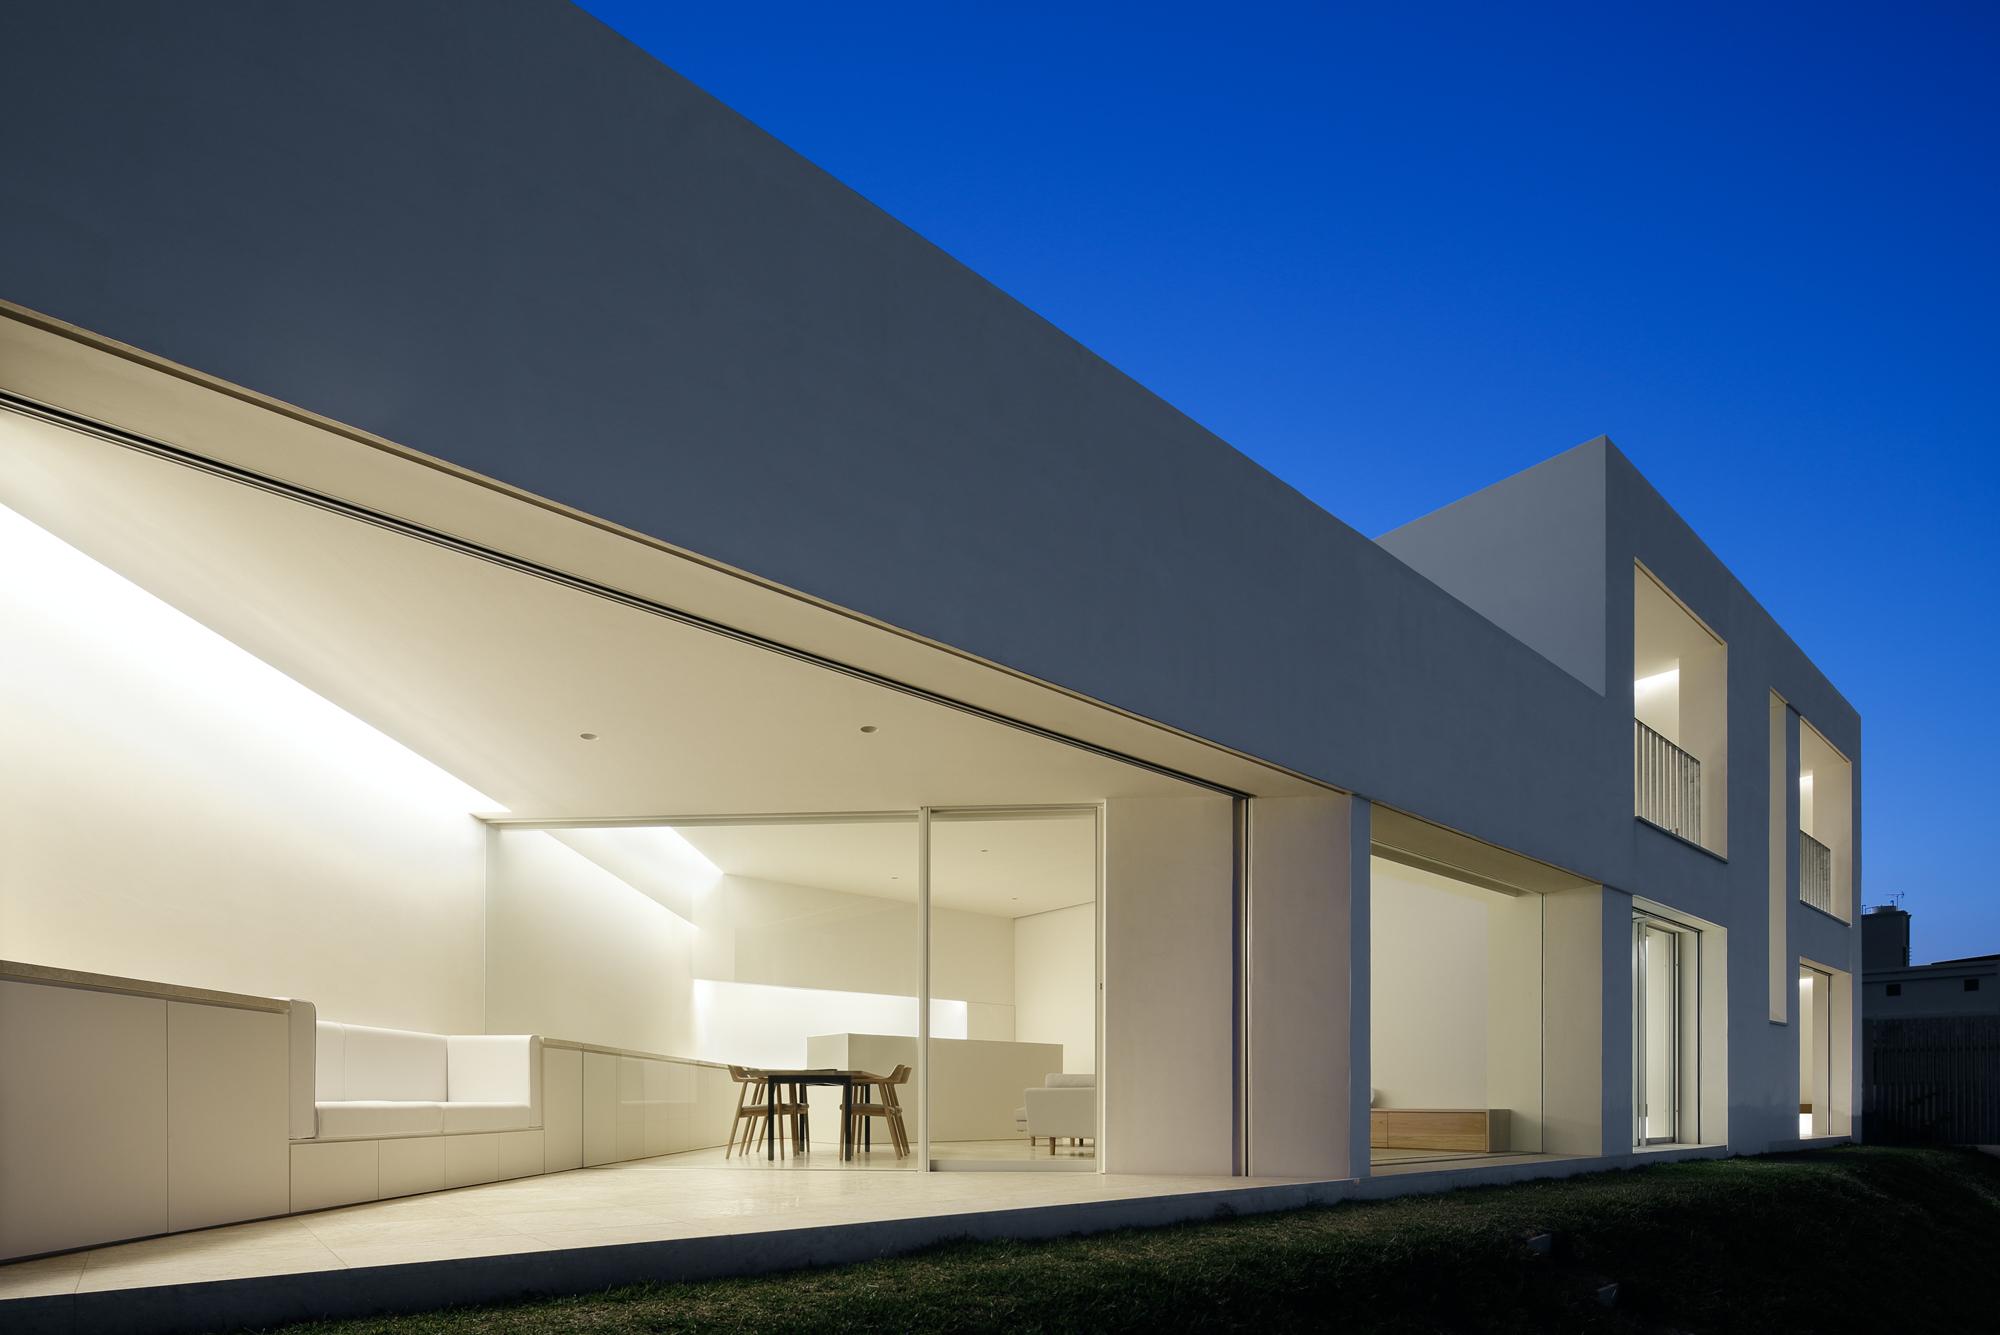 John Pawson Does Jutaku Architecture Agenda Phaidon